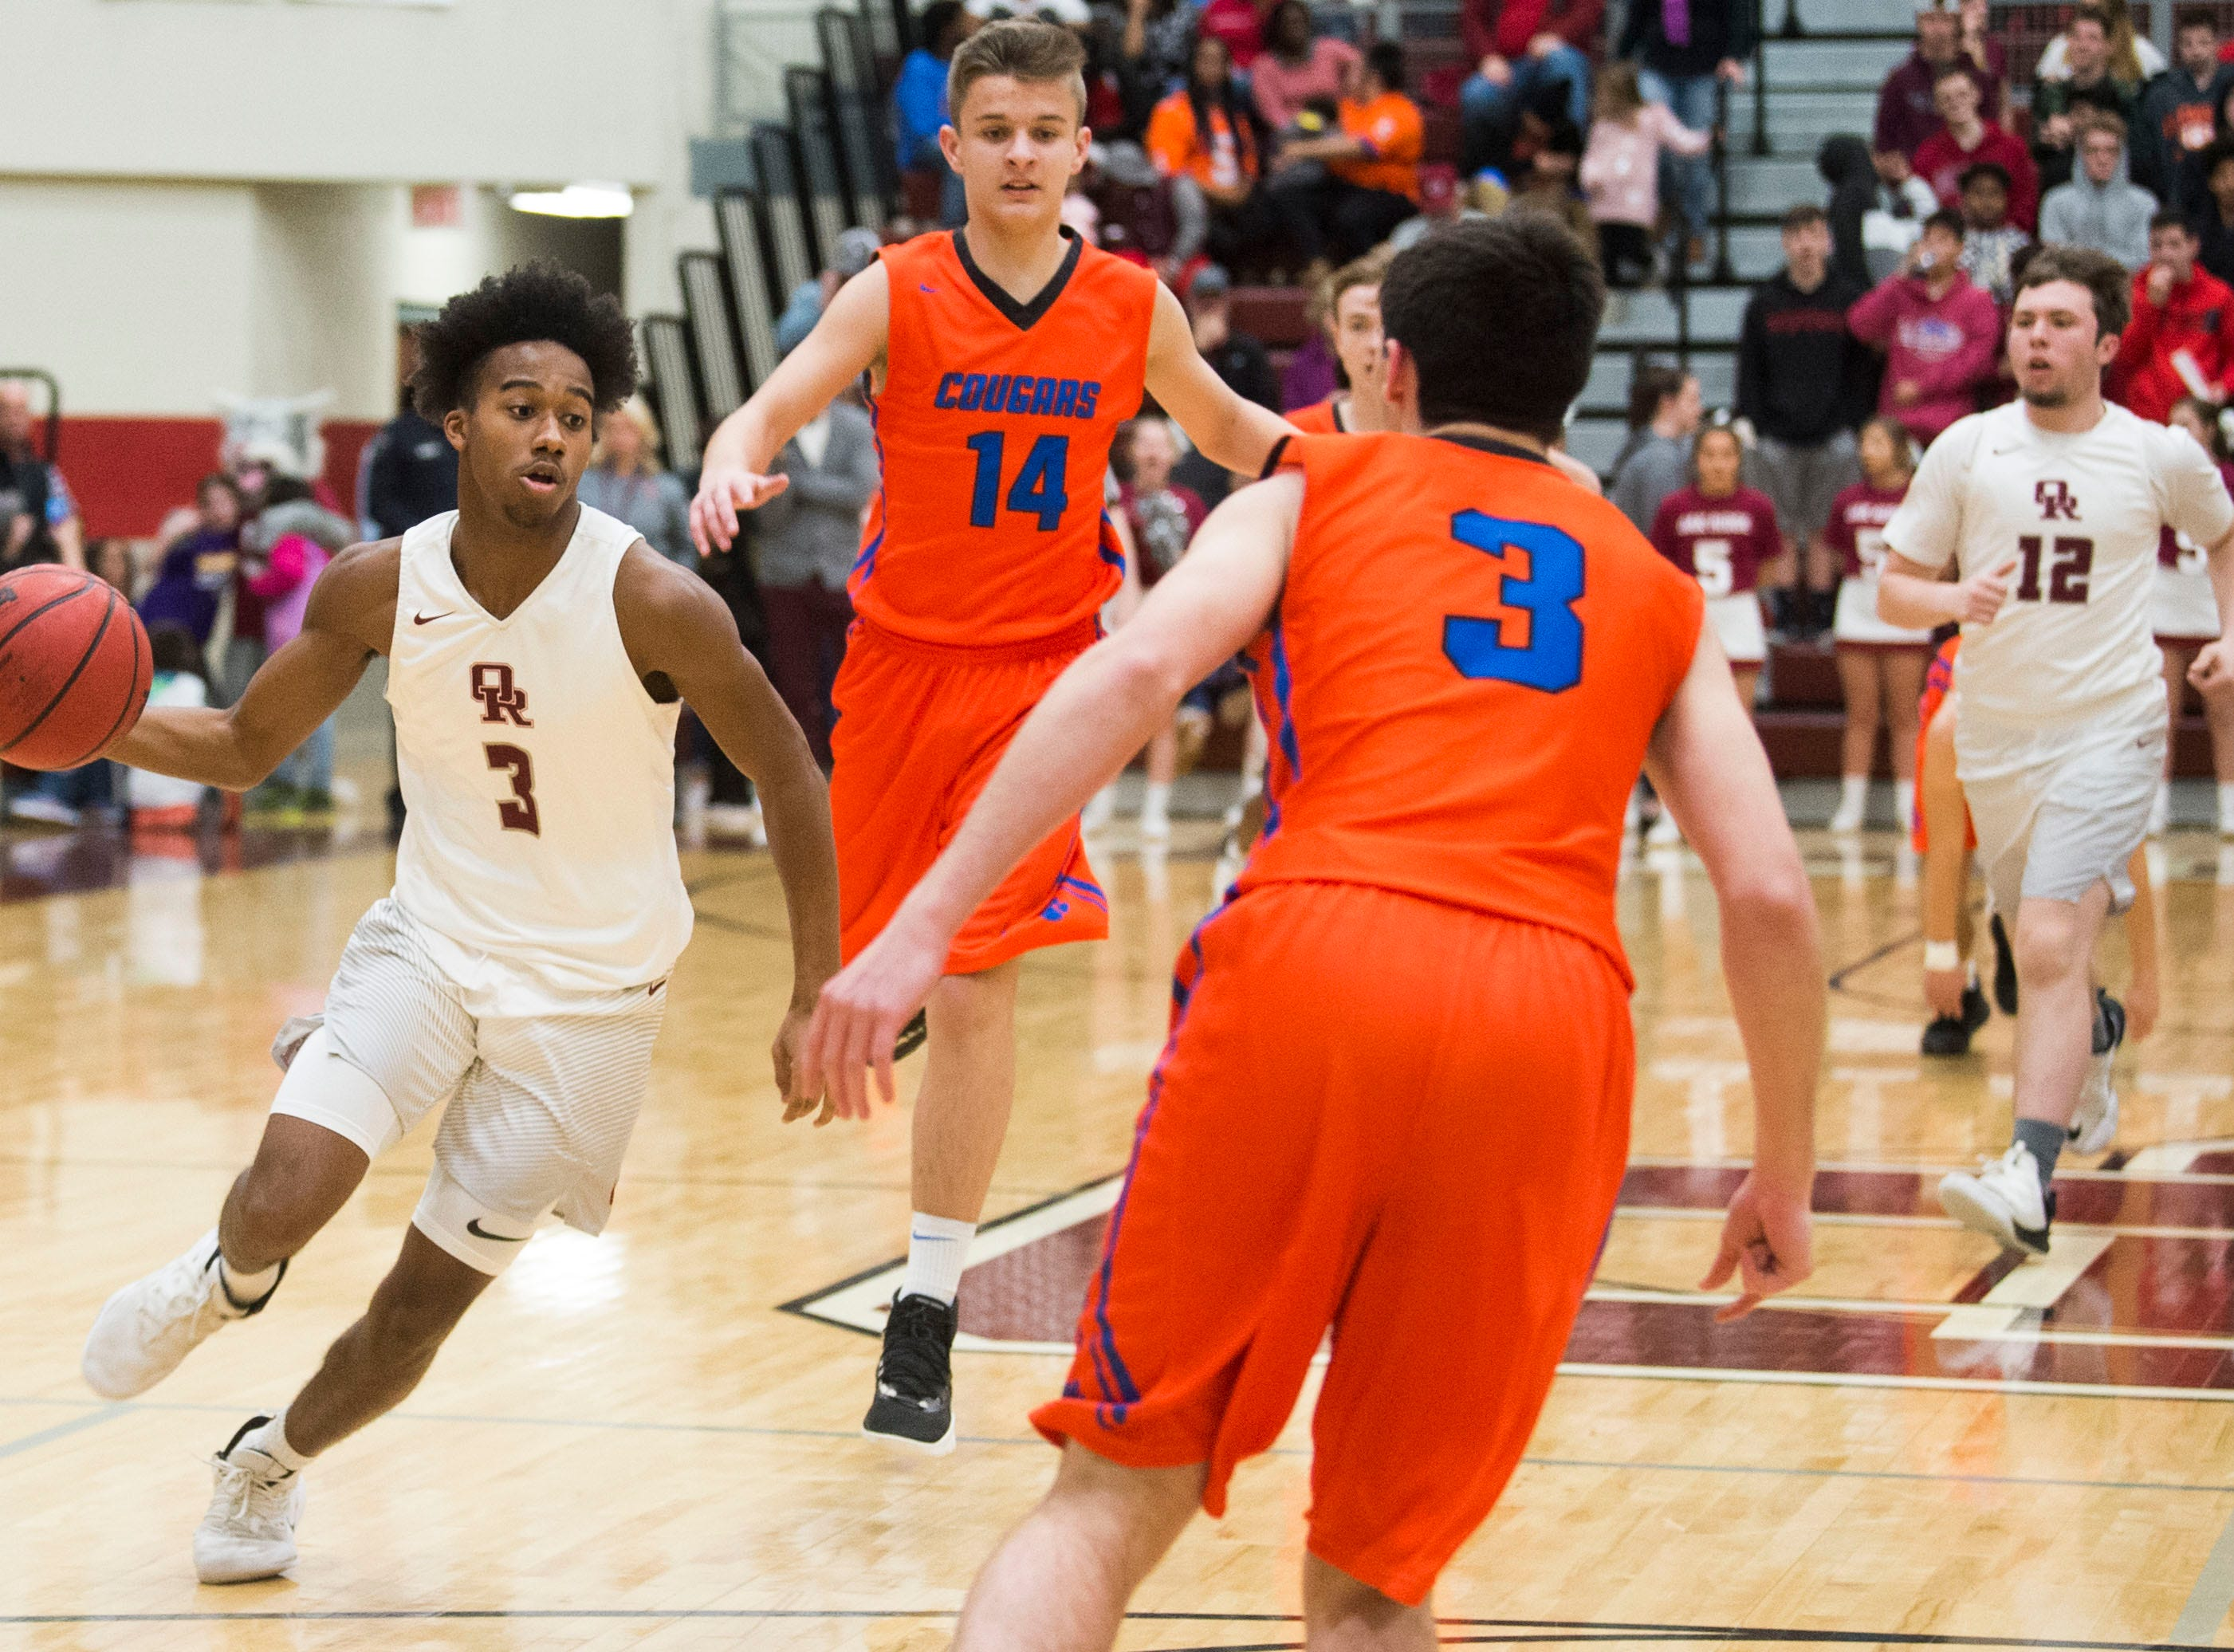 Oak Ridge's JaVonte Thomas (3) drives down the court during a high school basketball game between Oak Ridge and Campbell County at Oak Ridge Friday, Feb. 1, 2019.